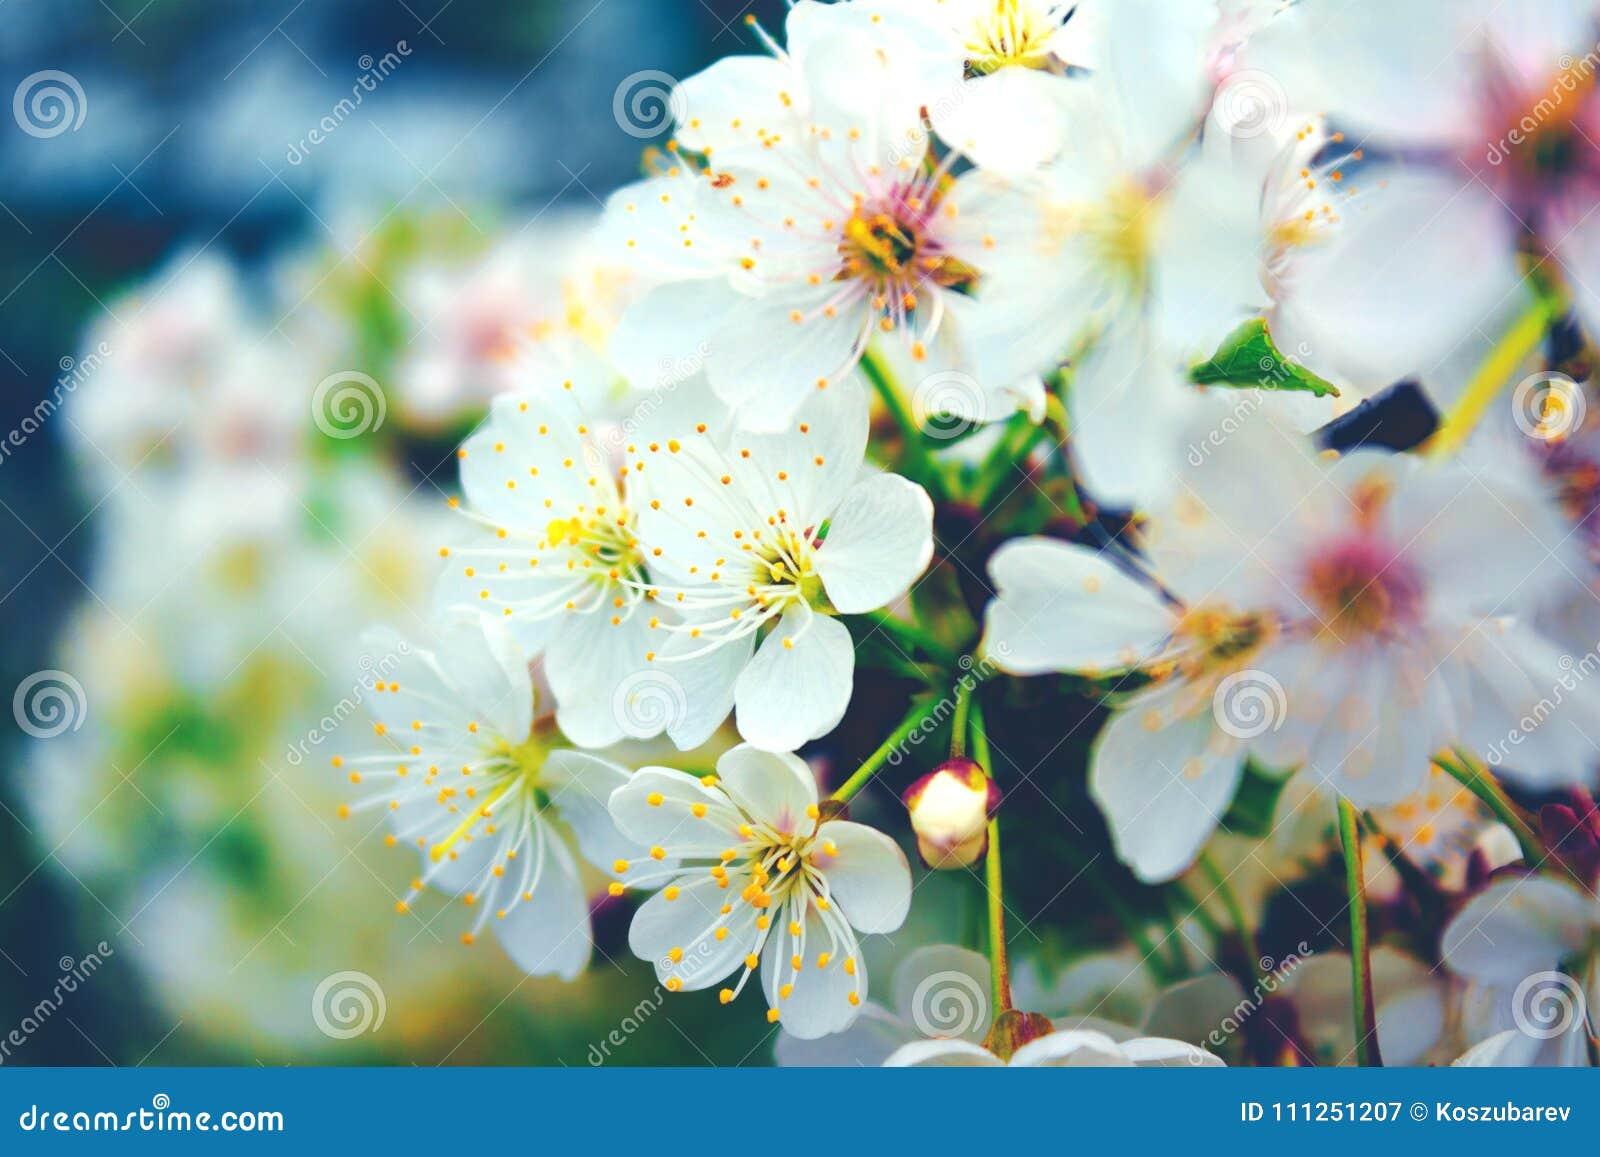 Cherry Blossom Tree Stock Image Image Of Design Bloom 111251207